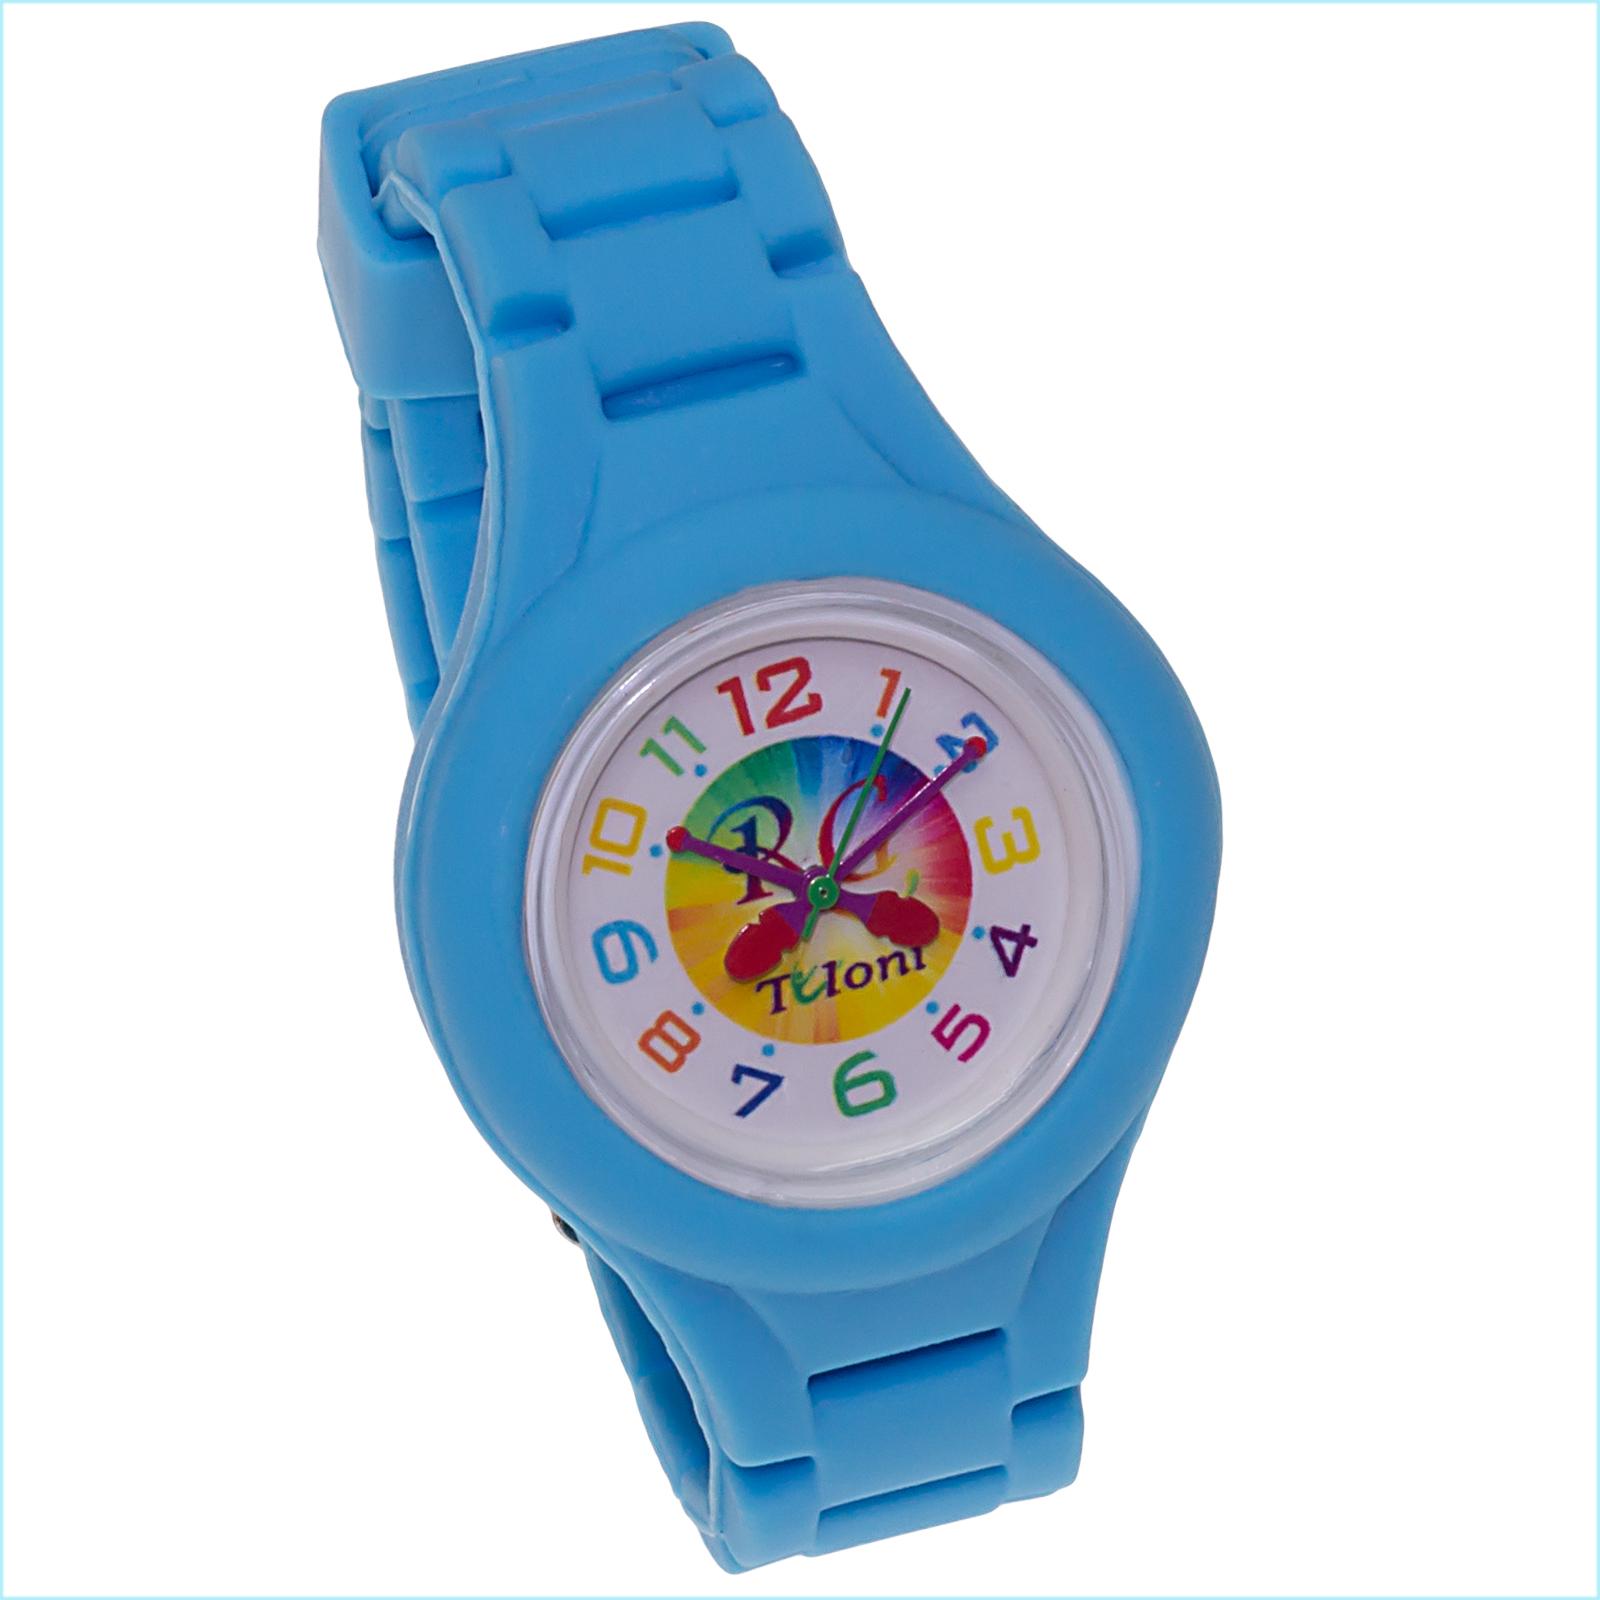 Часы Tuloni модель#3 ремешок#2 цвет Голубой Артикул T0203-2LB